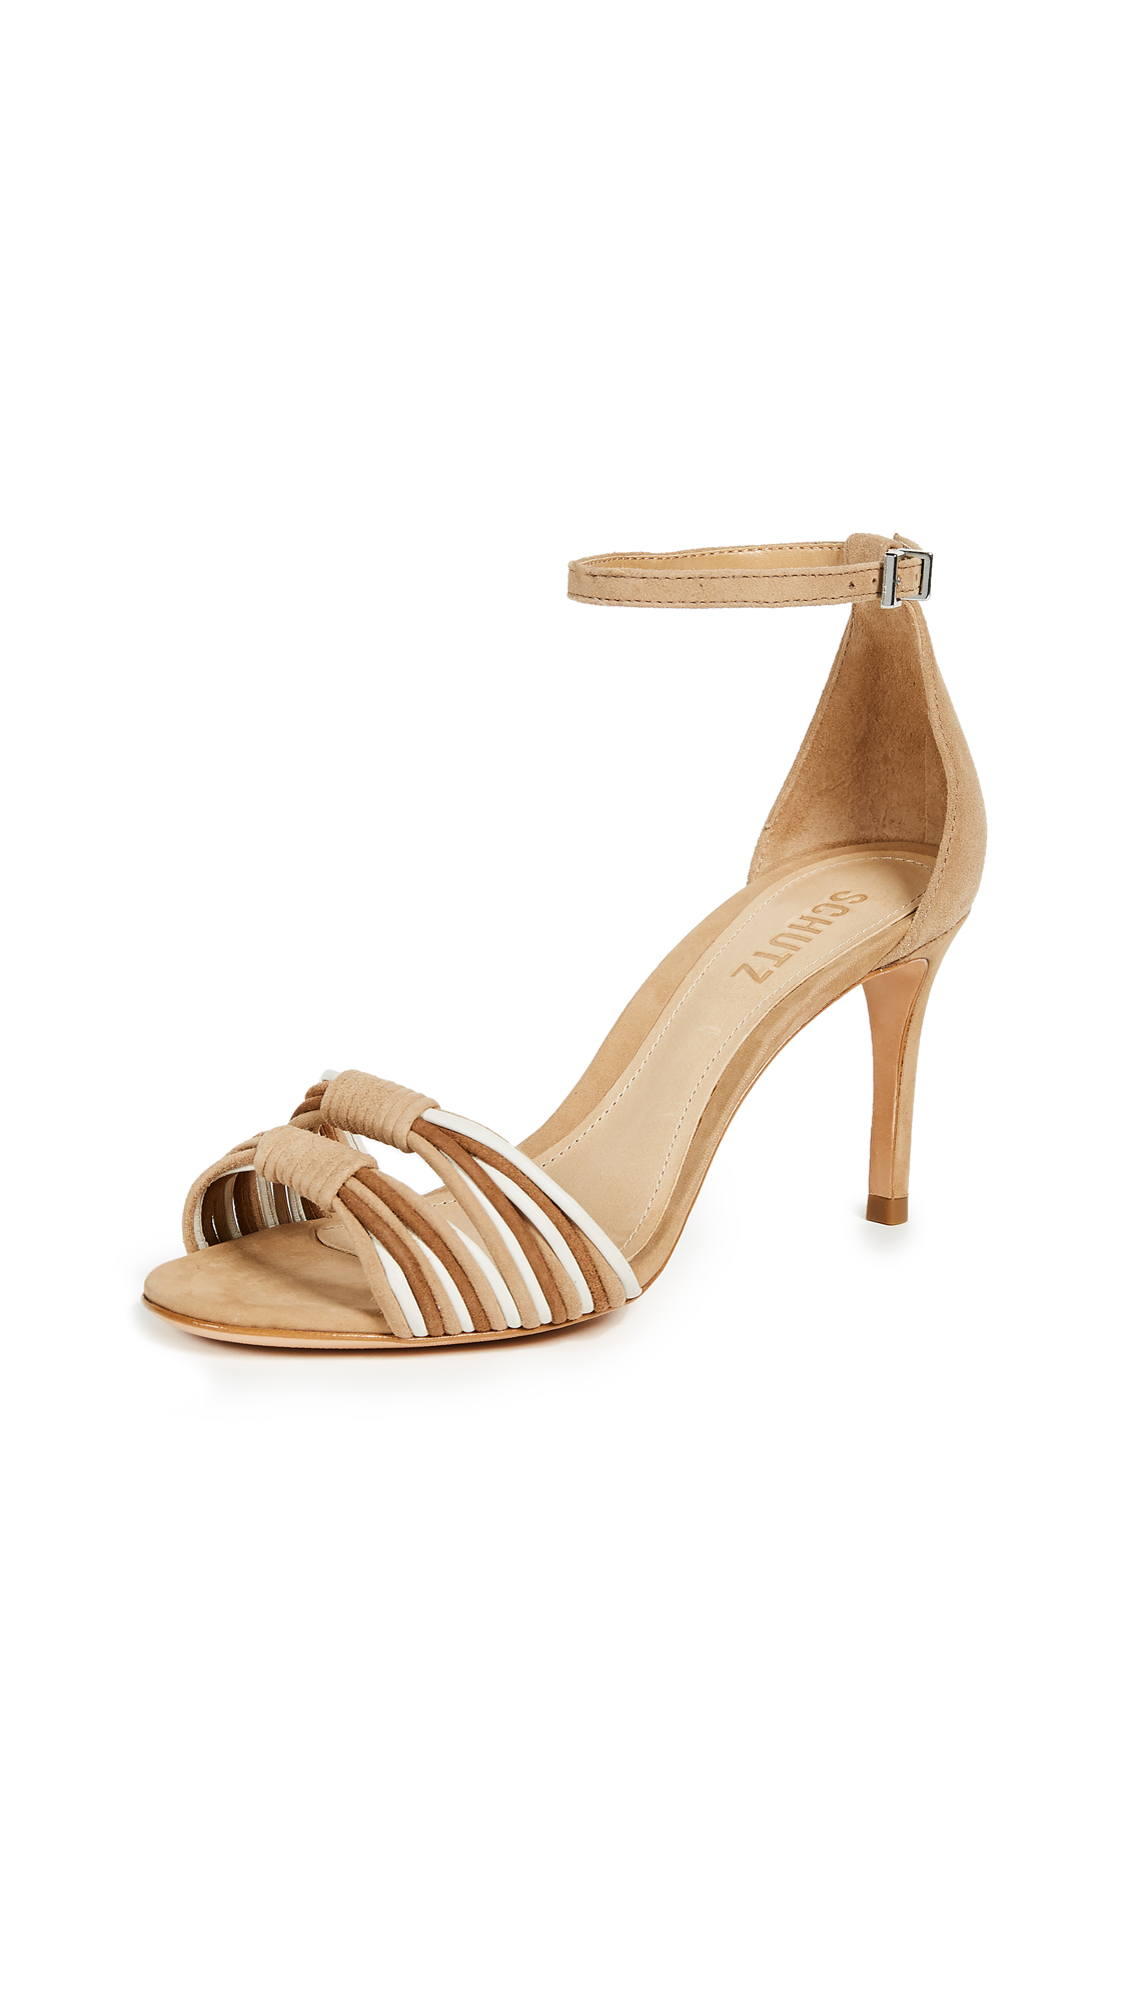 Schutz Joolian Ankle Strap Sandals - Multi